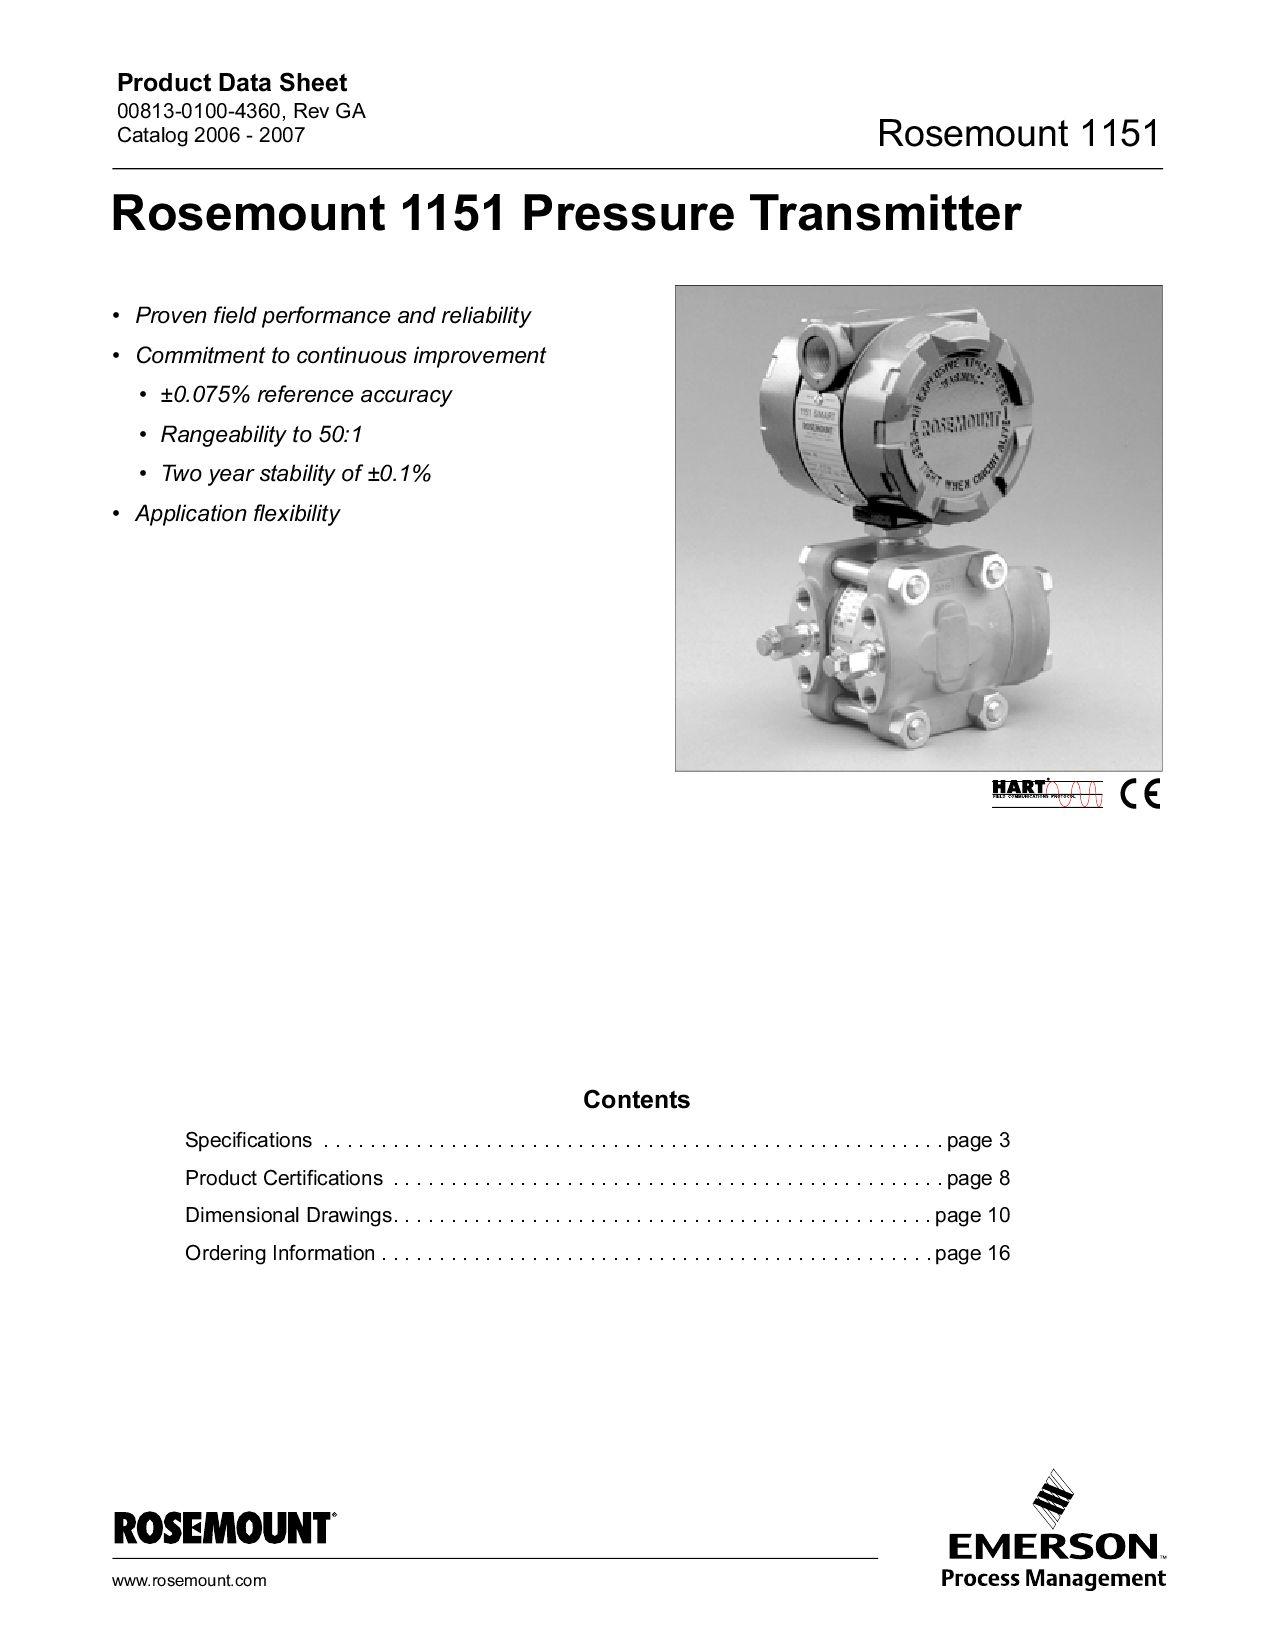 Rosemount 1151 Pressure Transmitter - catalog 2006 - 2007 by luppo on barrett wiring diagram, harmony wiring diagram, fairmont wiring diagram, wadena wiring diagram, regal wiring diagram, walker wiring diagram, becker wiring diagram, ramsey wiring diagram,